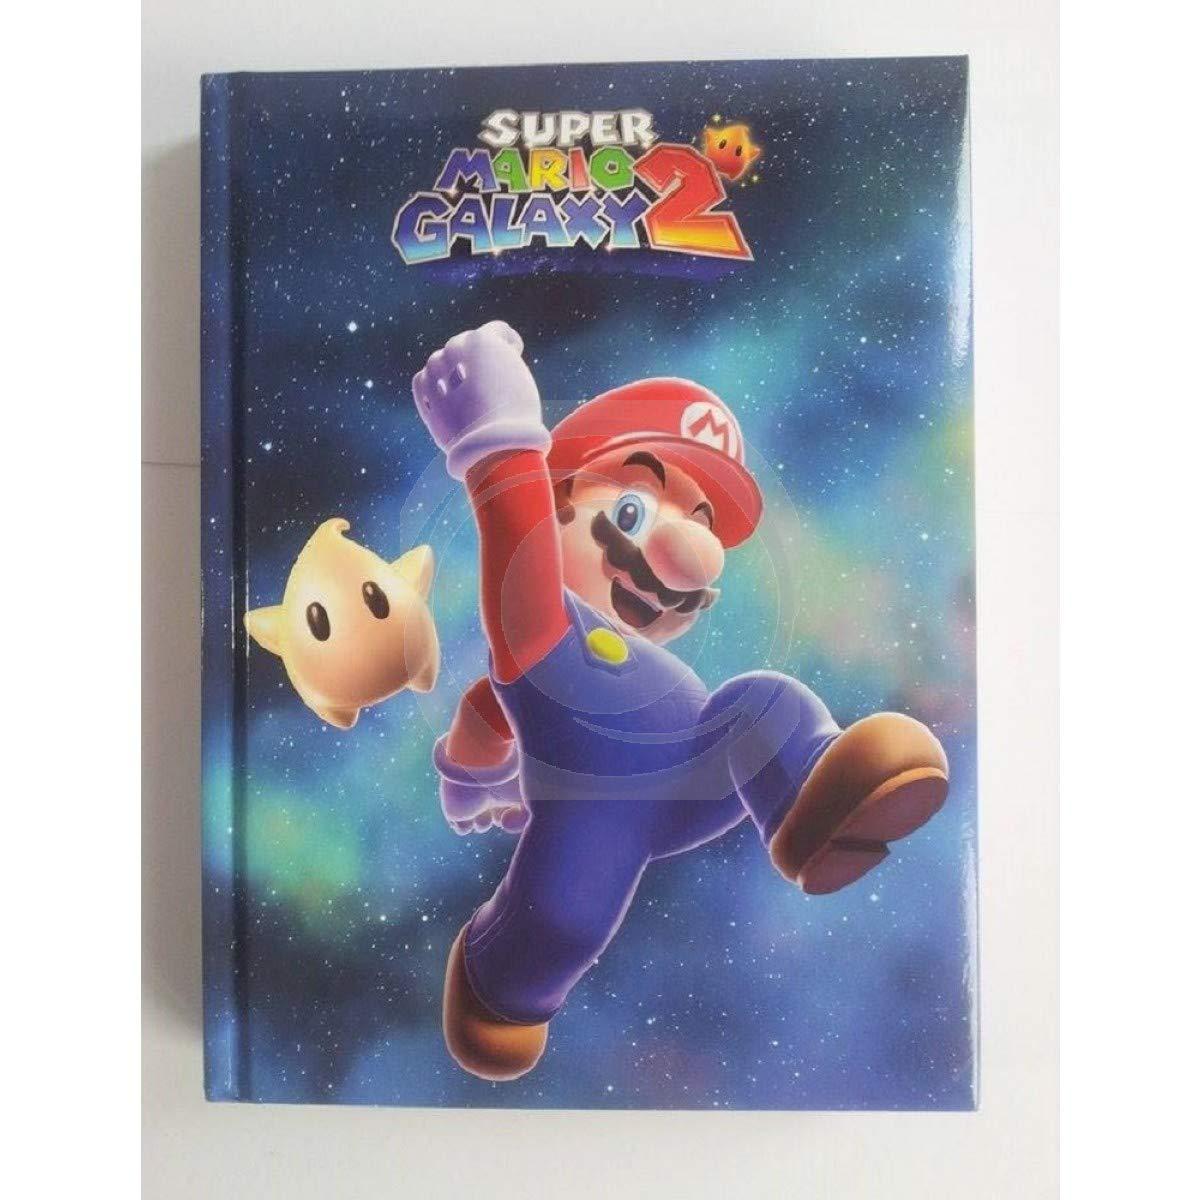 Agenda escolar de 10 meses, diseño de Super Mario Galaxy ...